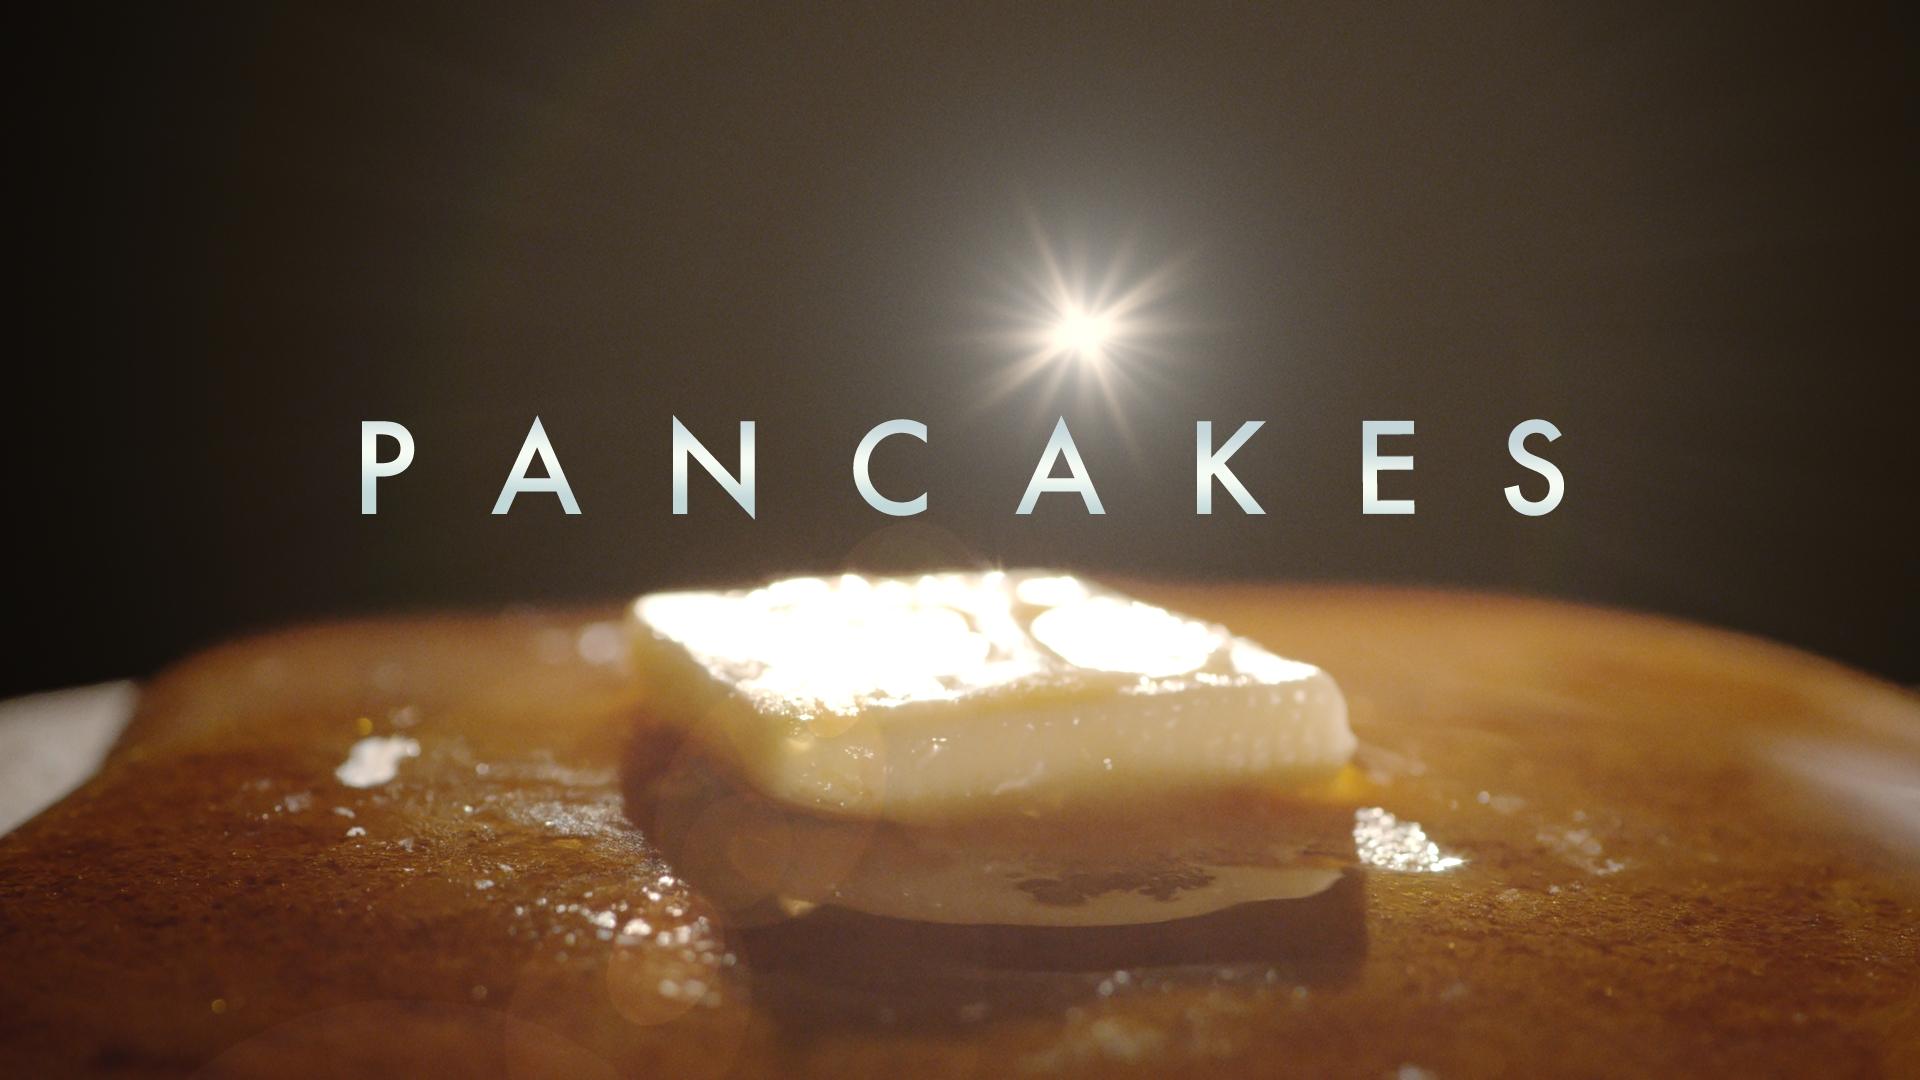 pancakes1.00086619.jpg